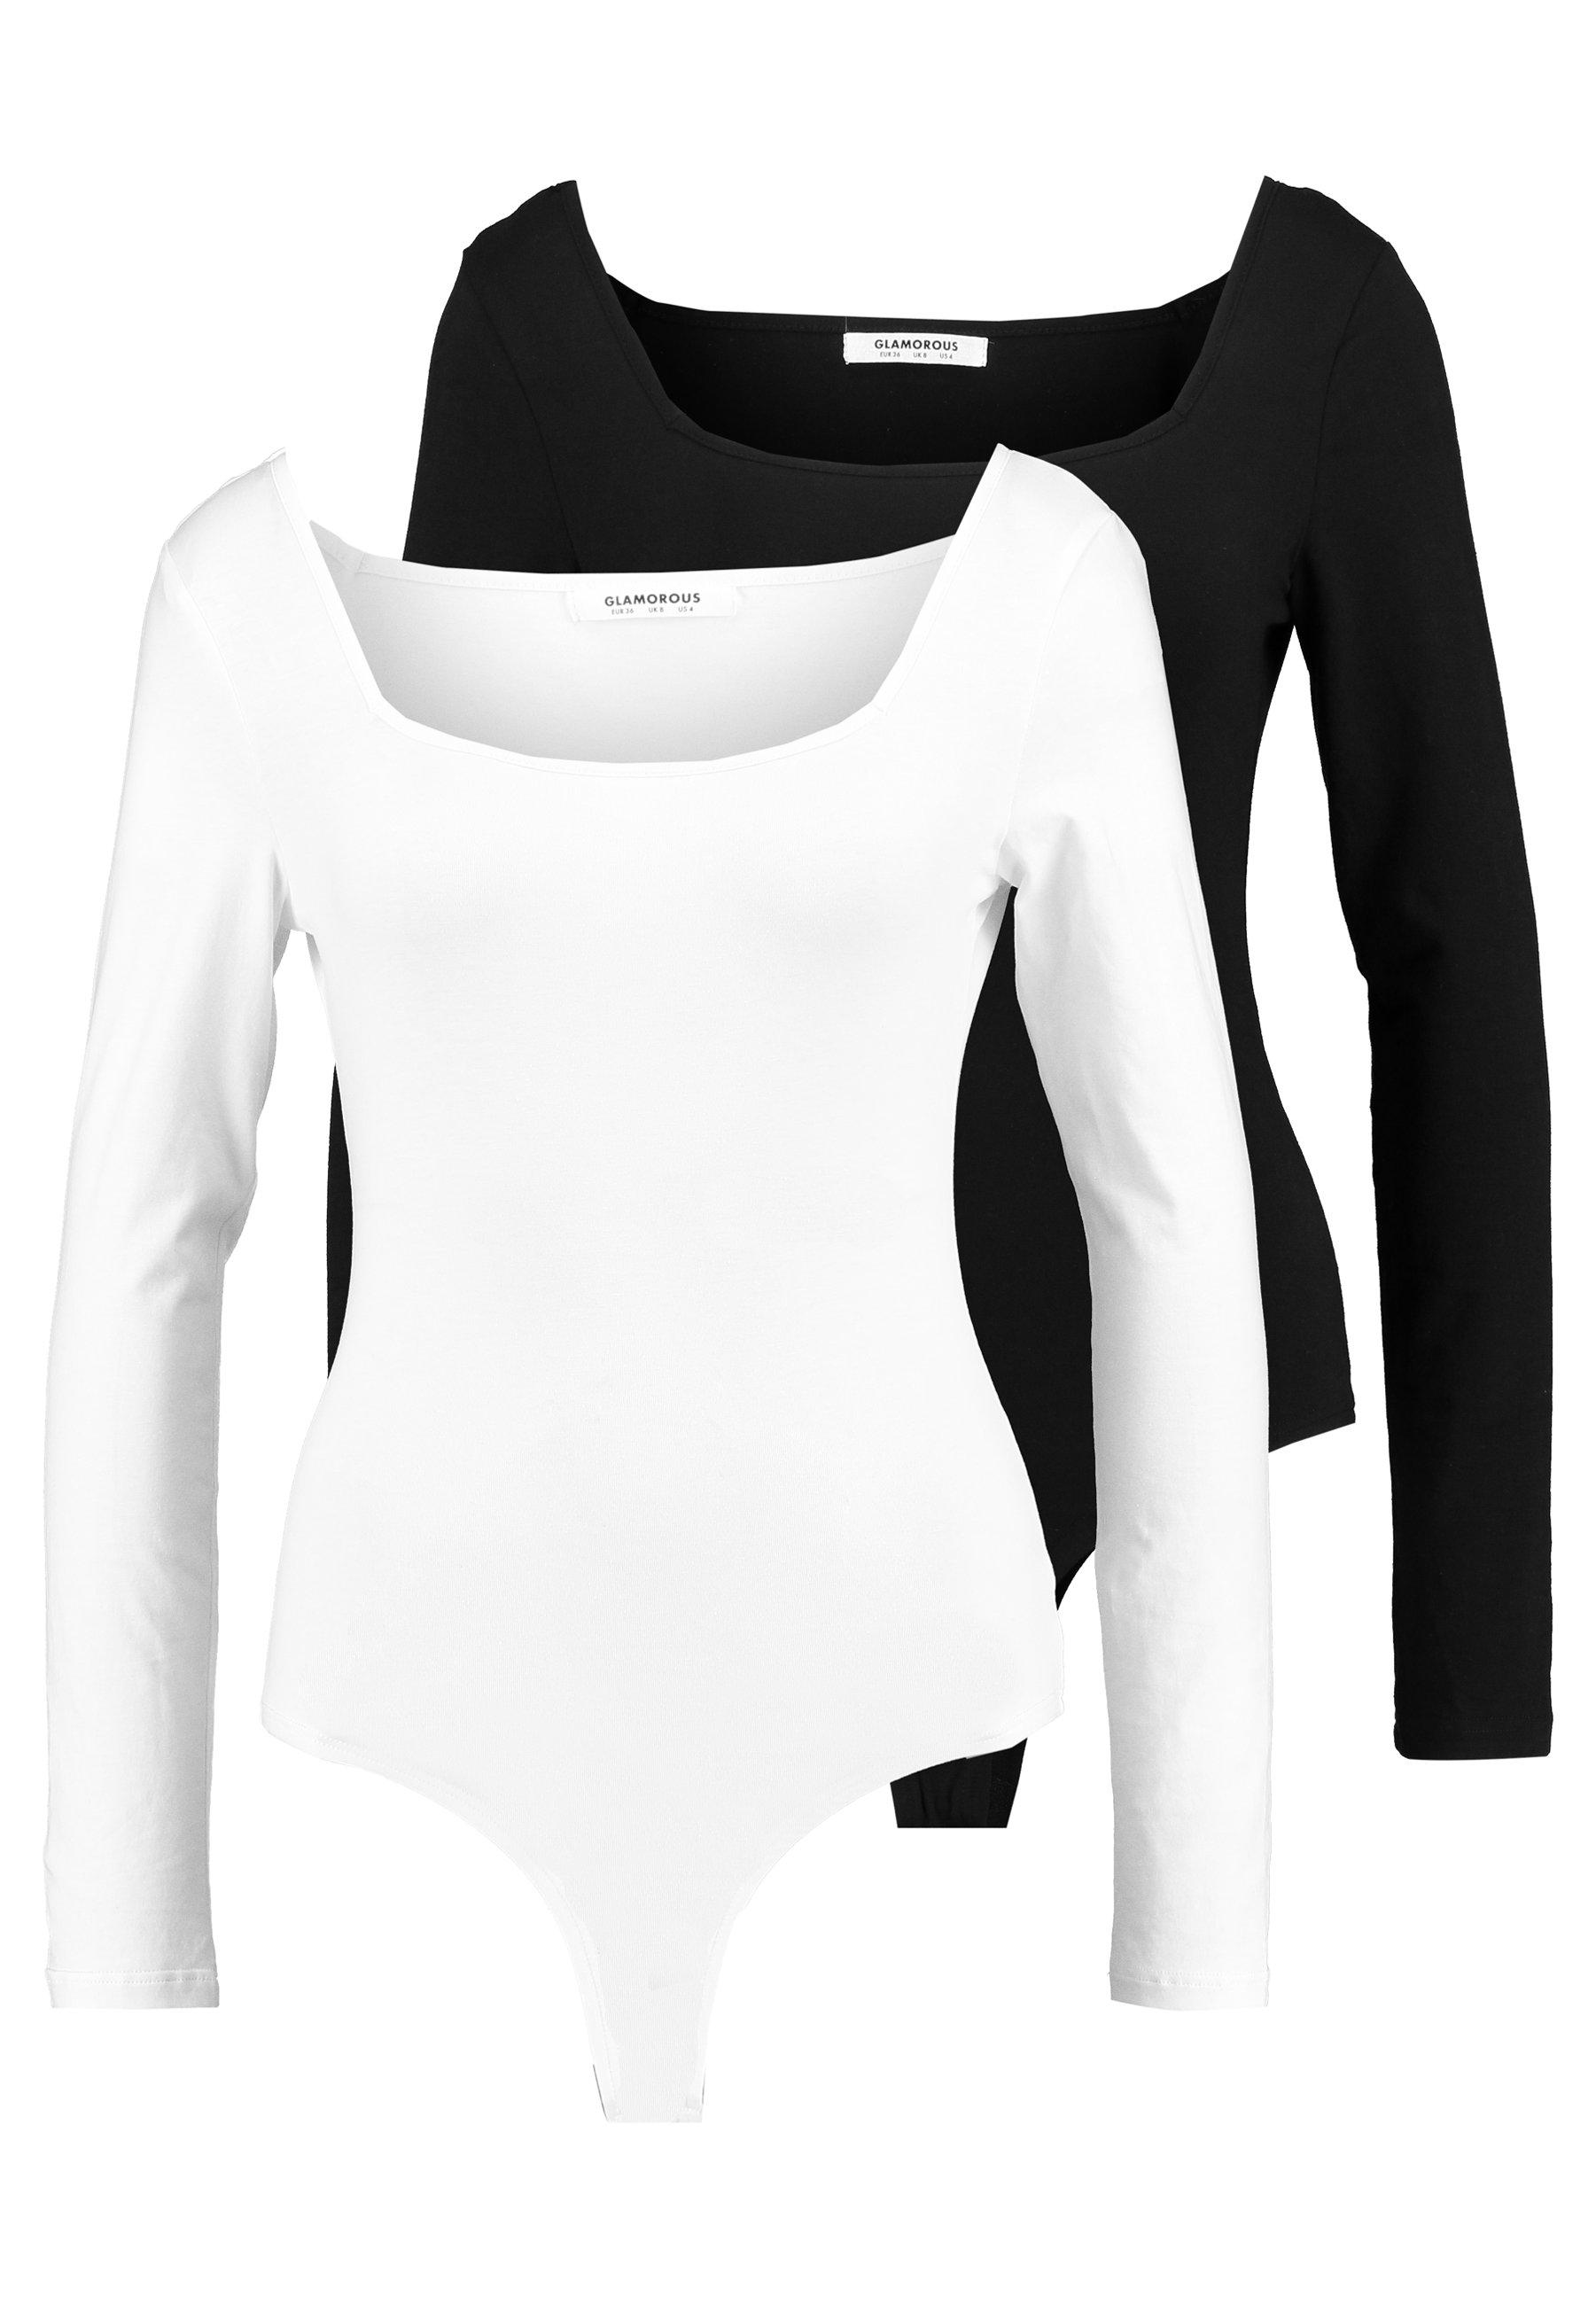 shirt Black 2 Glamorous Longues Manches PackT cream À trBdCsQohx